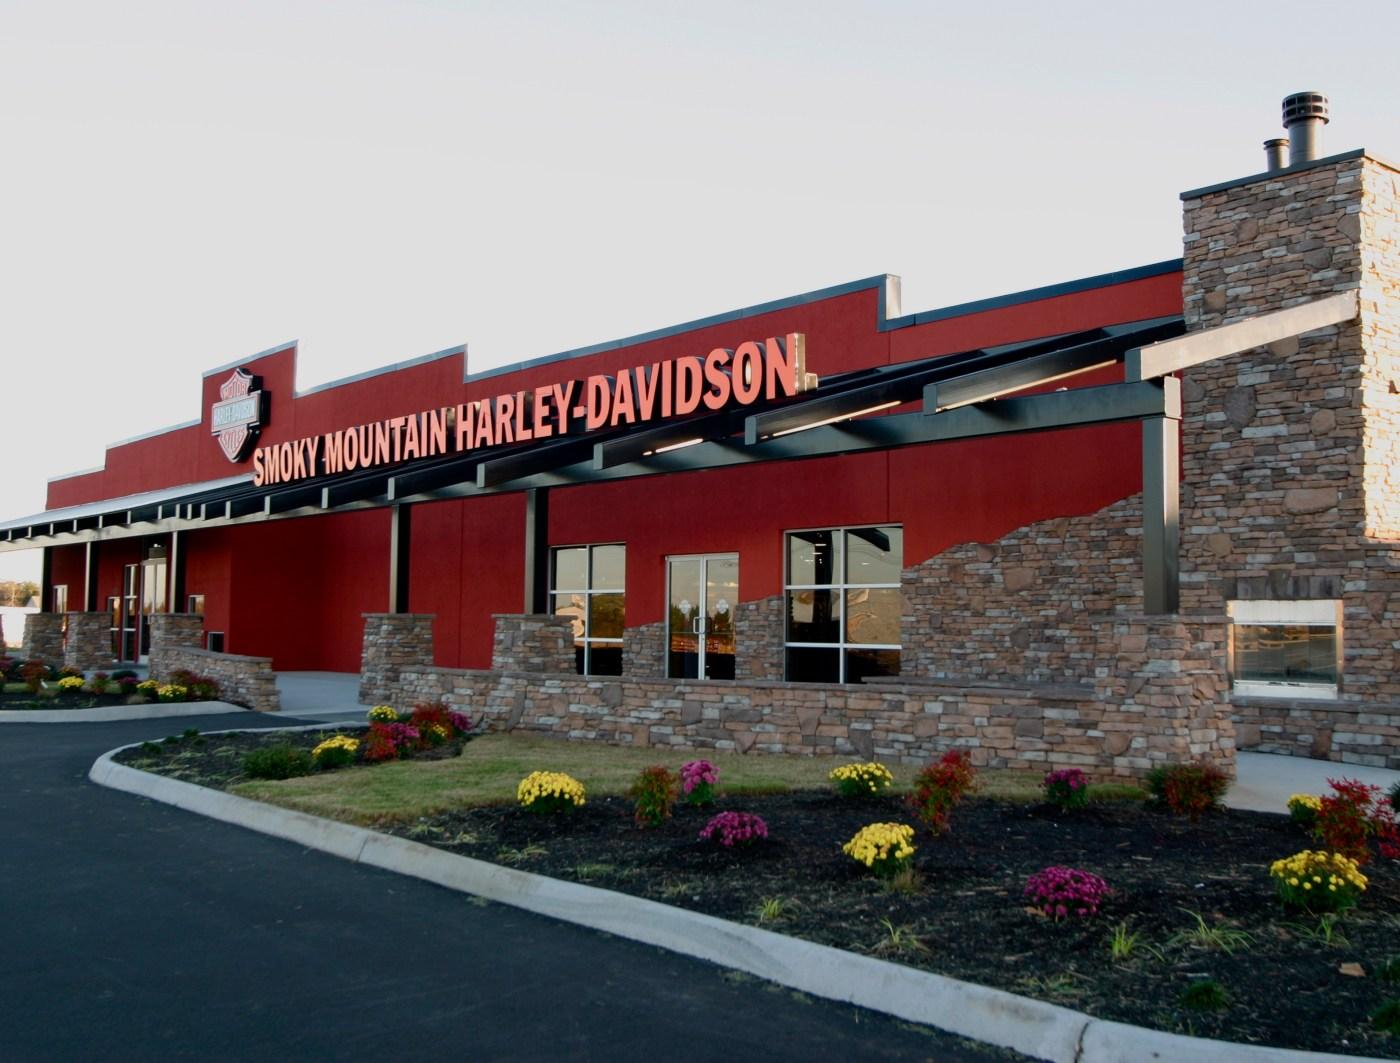 Photo: Smoky Mountain Harley-Davidson